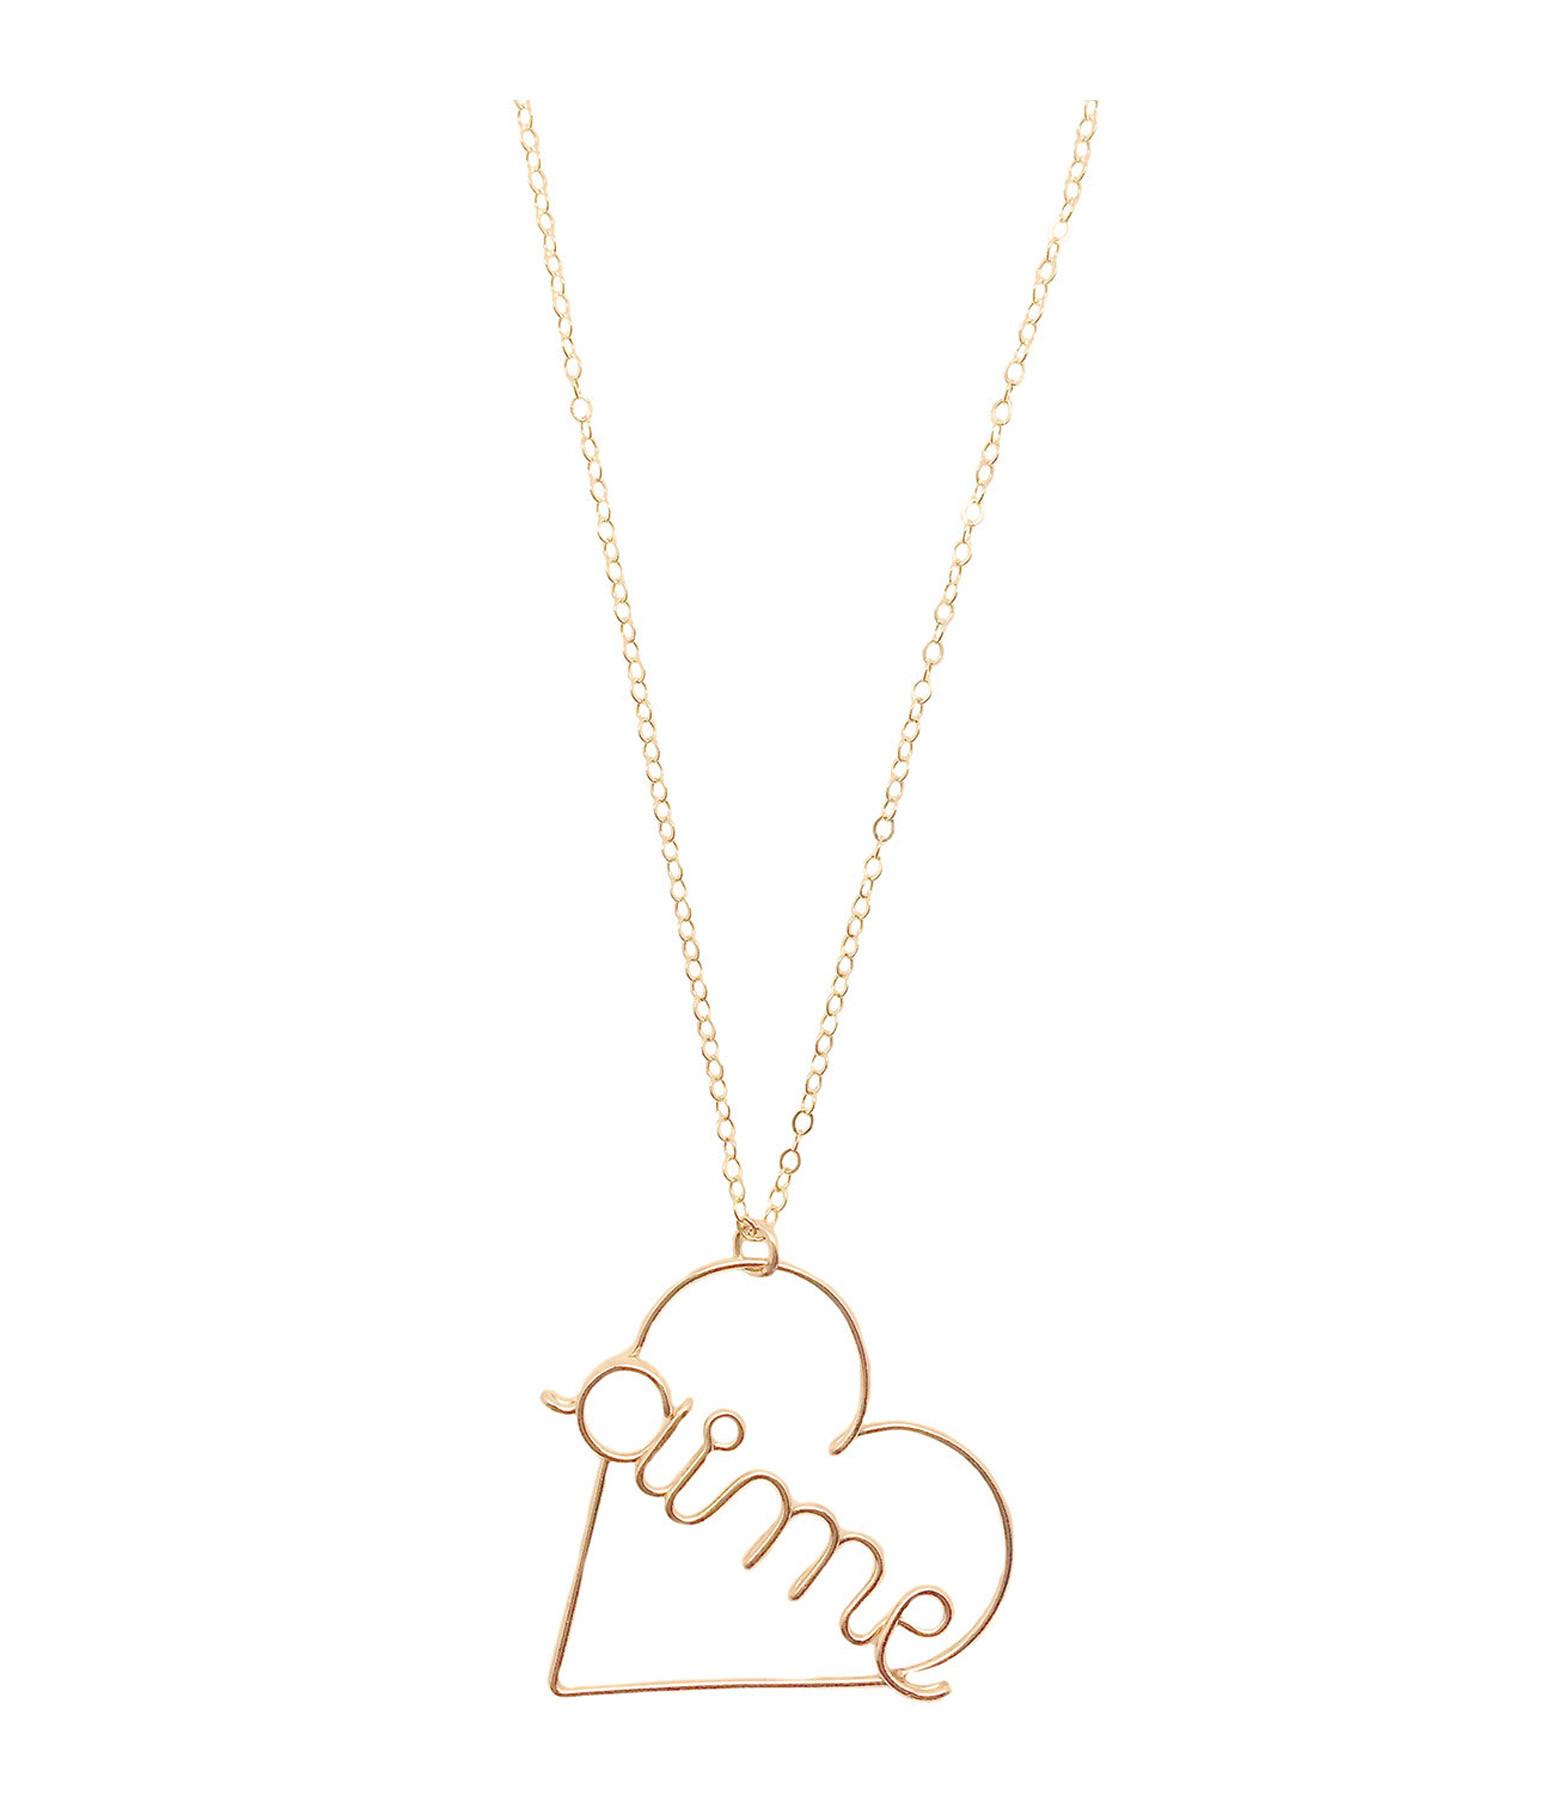 ATELIER PAULIN - Collier Aime PM Gold Filled 14K, Atelier Paulin x Inside Closet